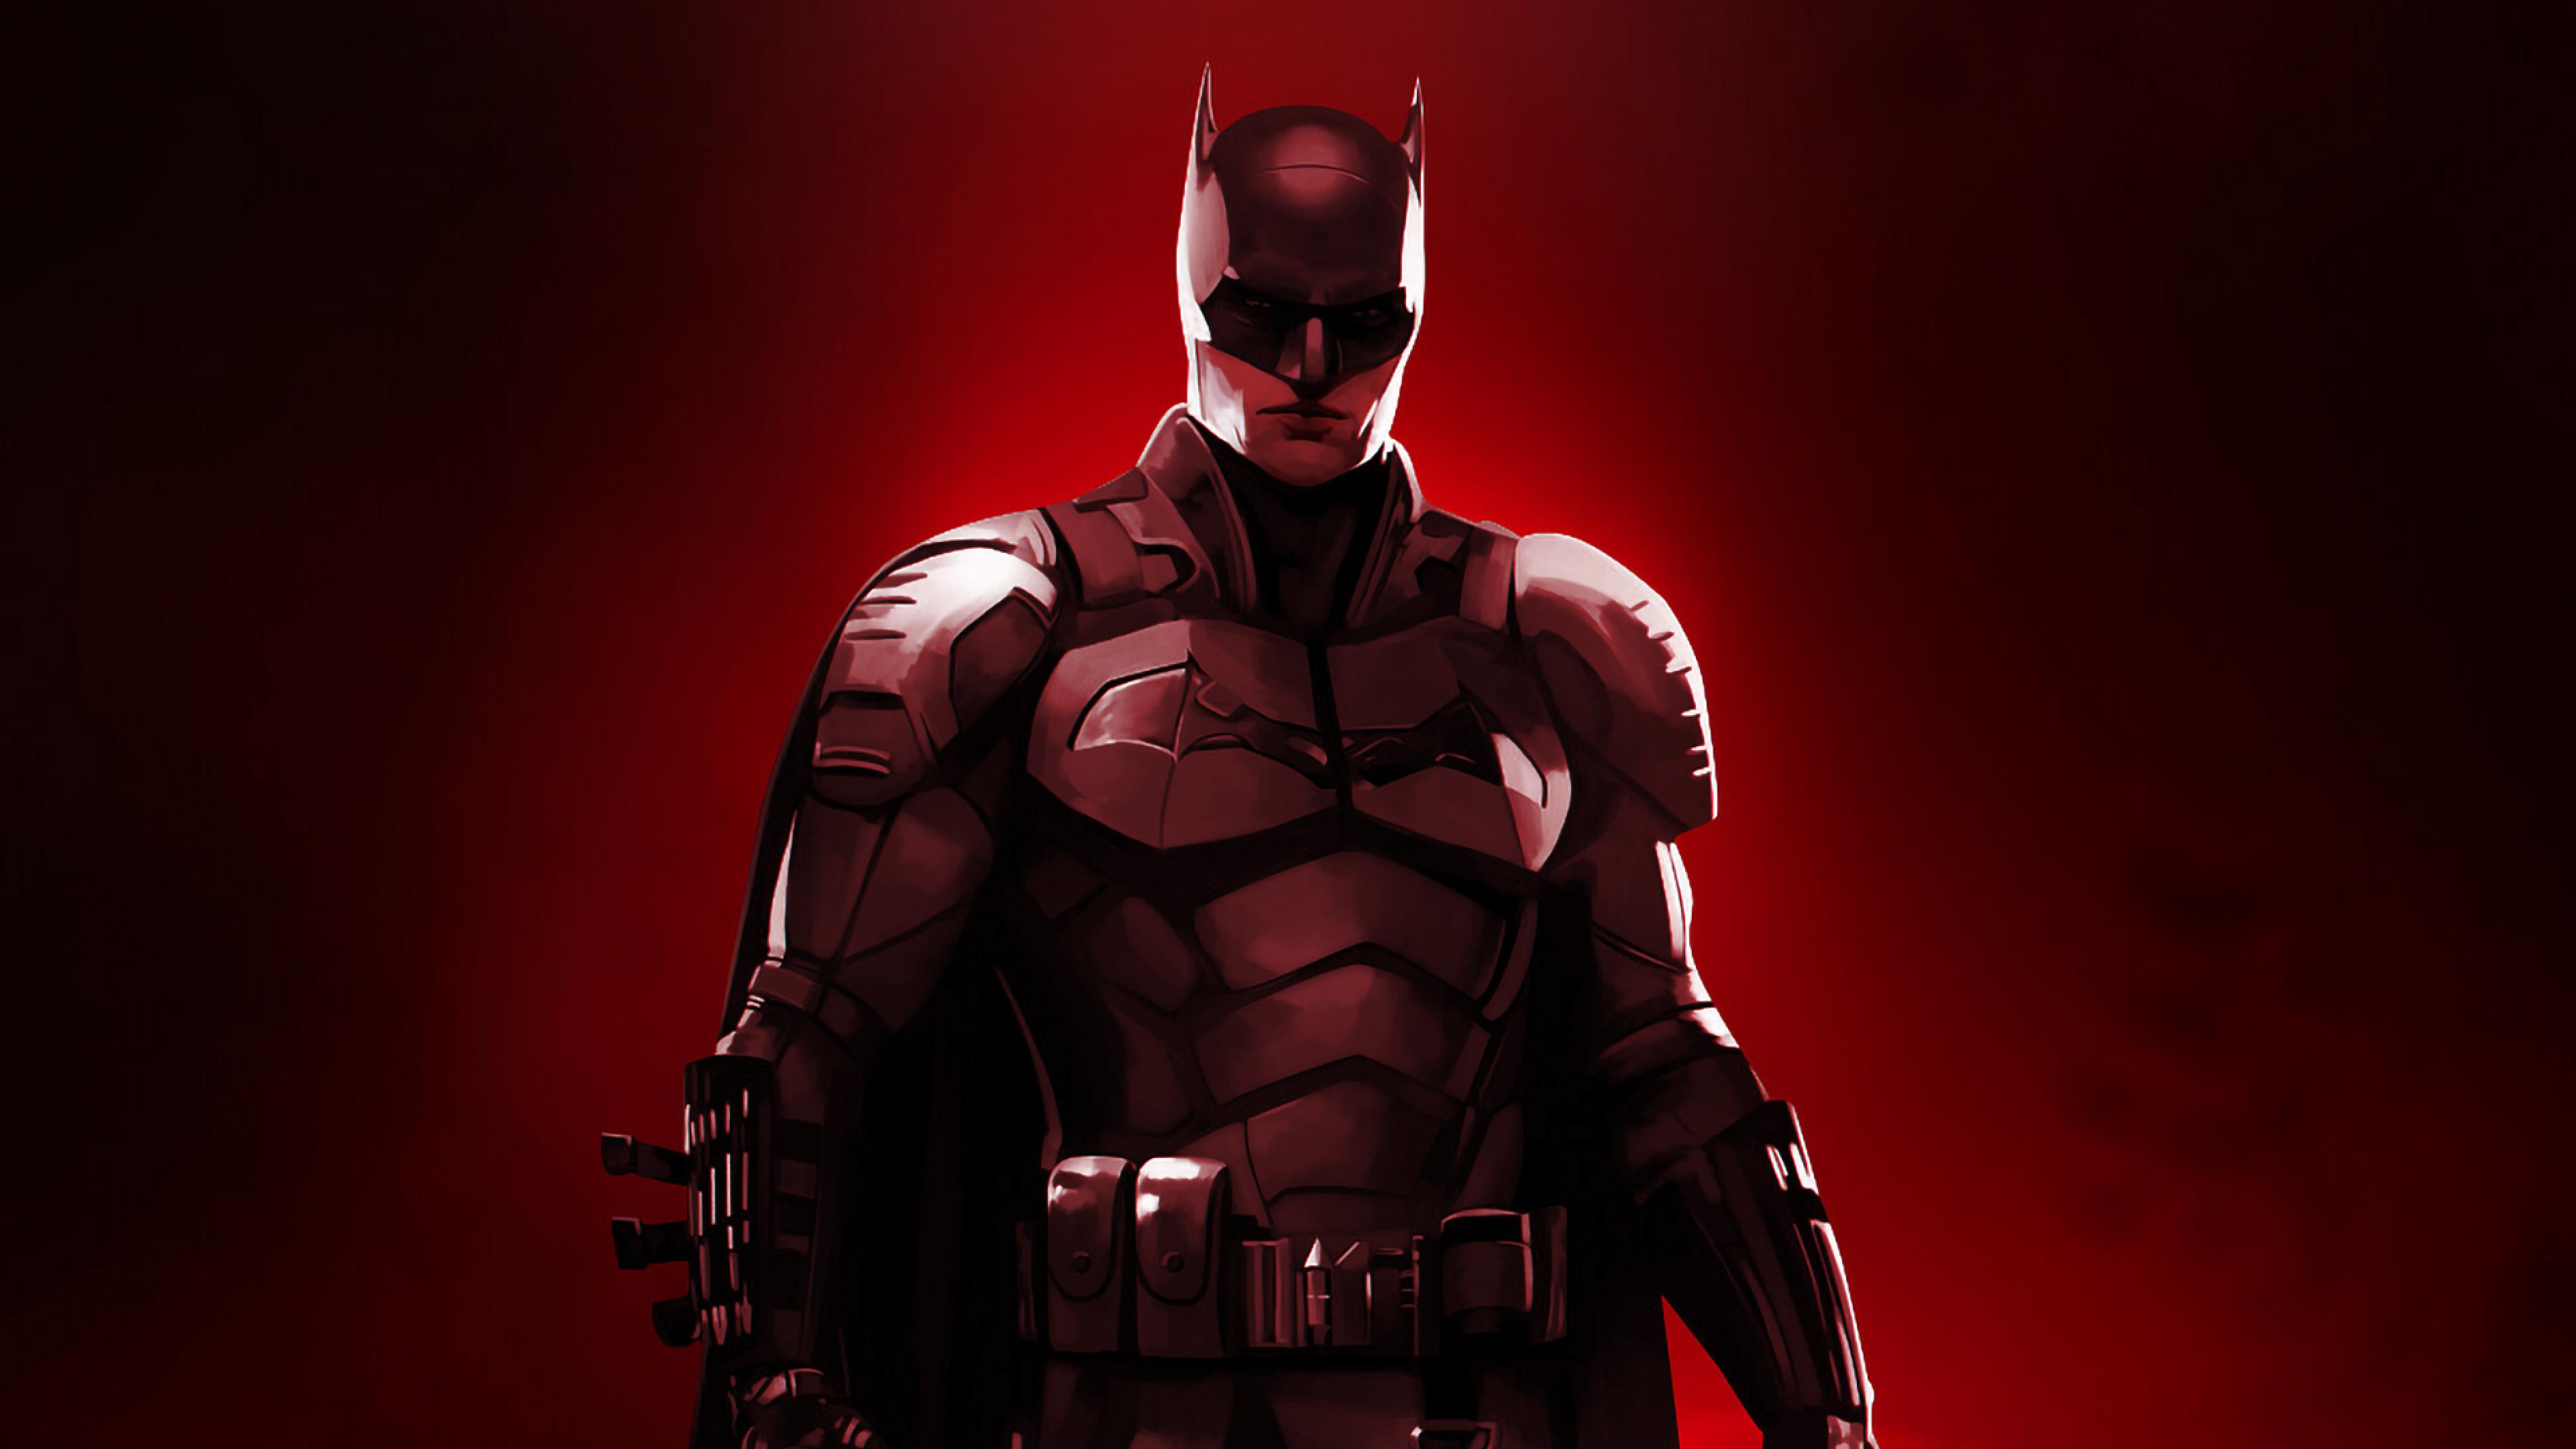 3840x2160 Cool Robert Pattinson as Batman 4K Wallpaper, HD ...